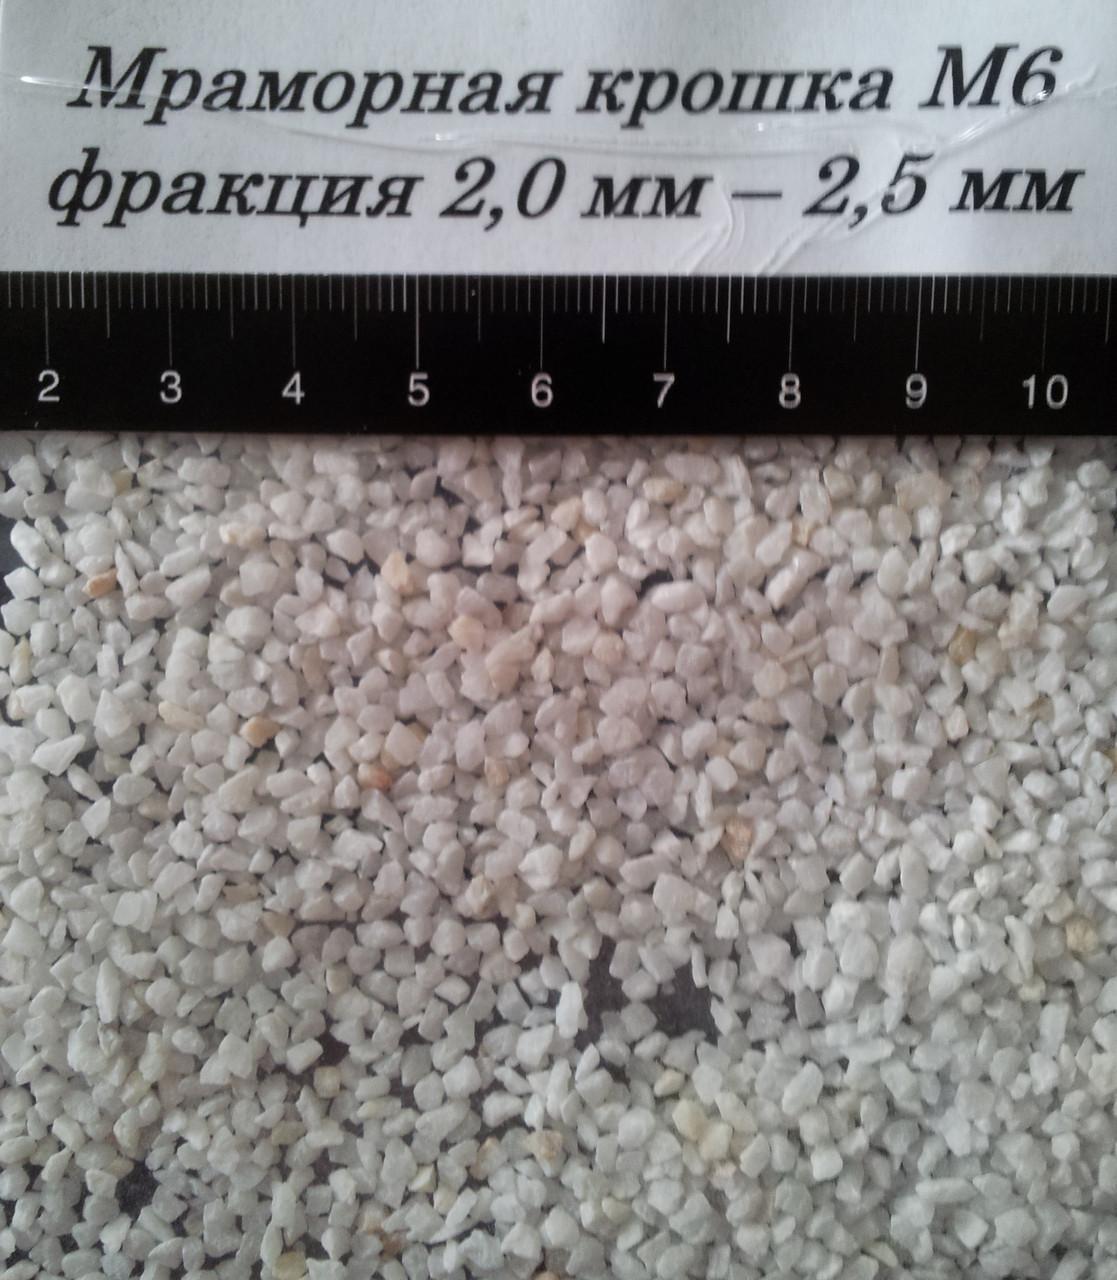 Мраморная крошка Nigtas М6 (2,0-2,5 мм) 40 кг